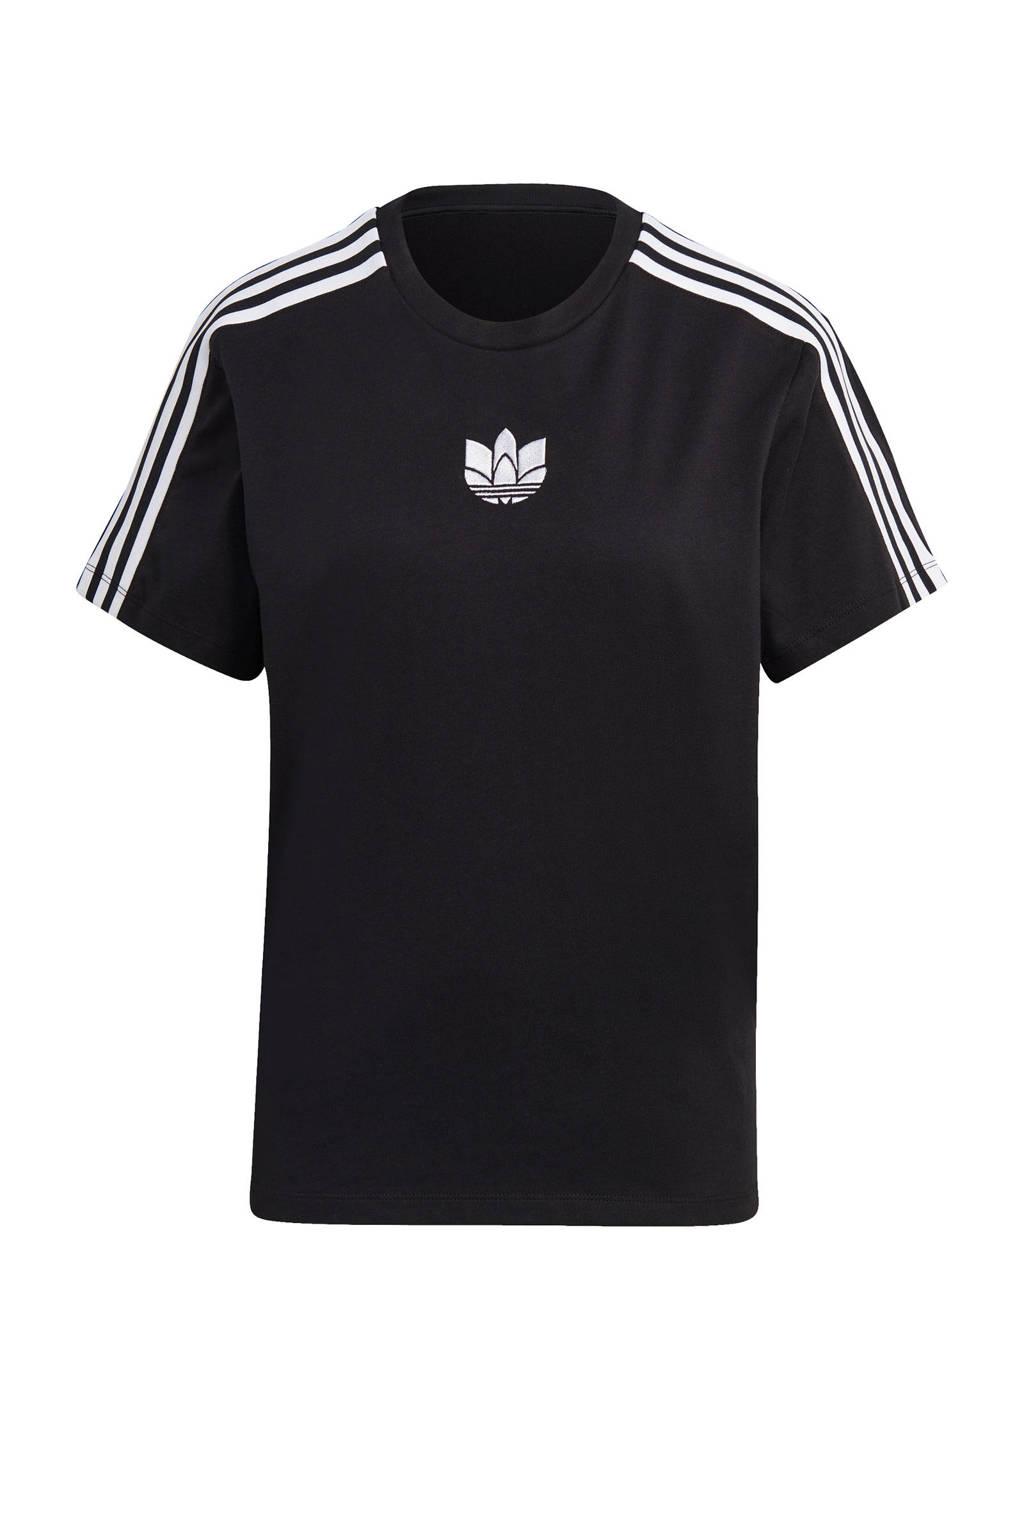 adidas Originals Adicolor T-shirt zwart, Zwart